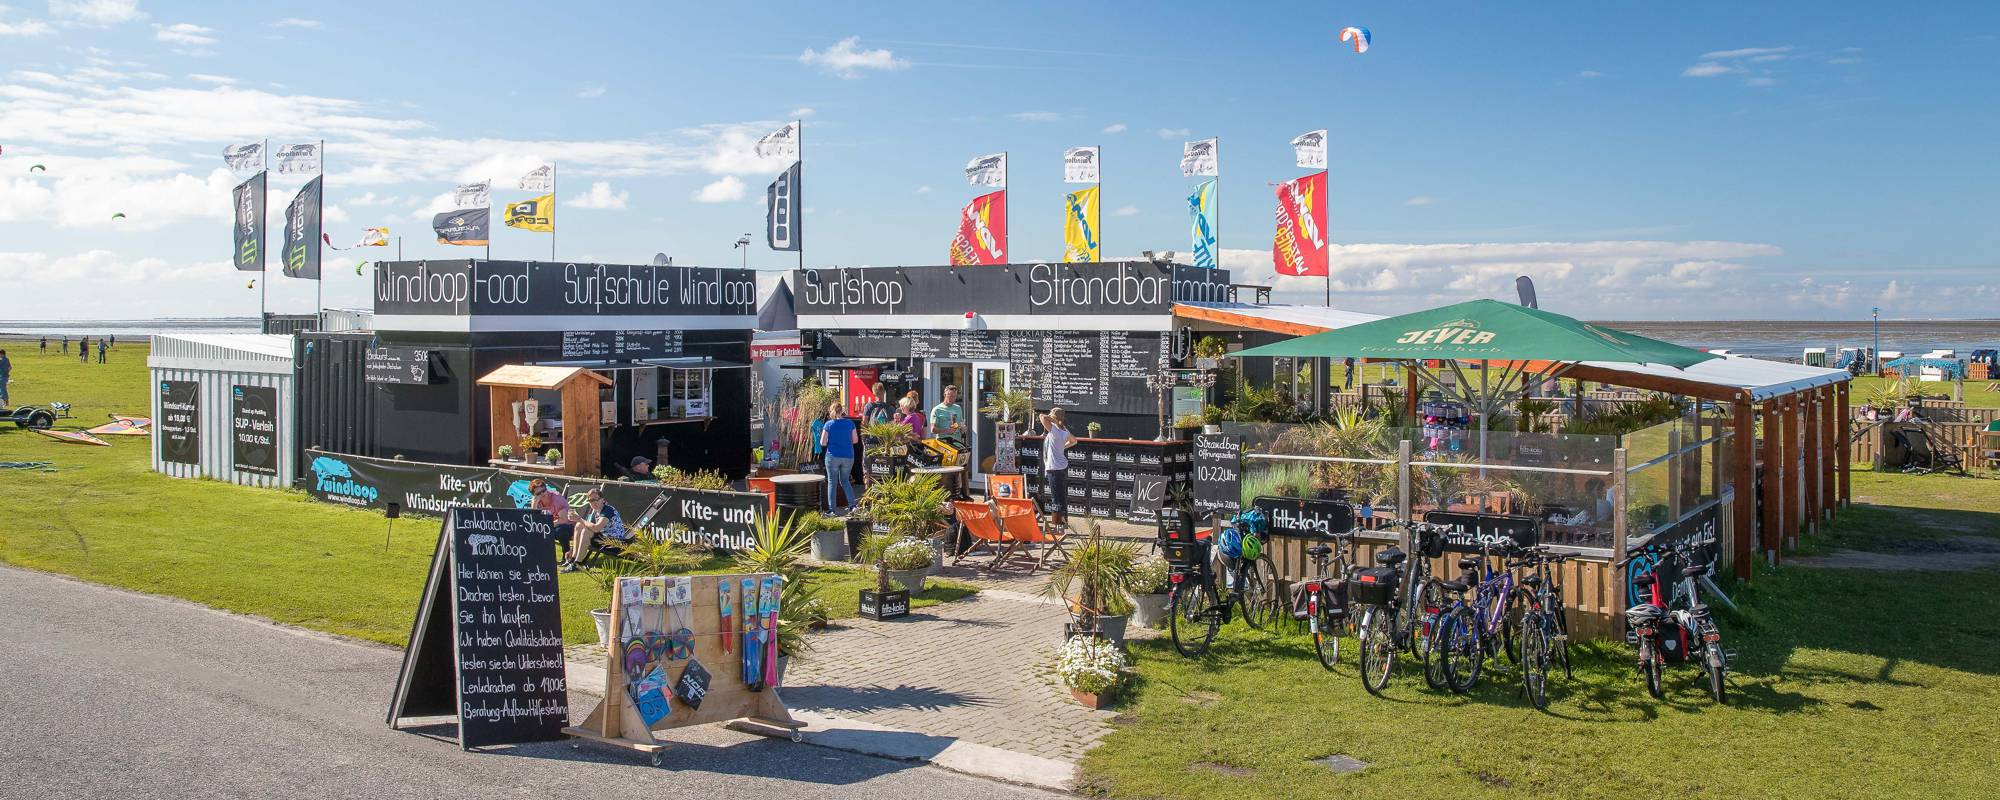 Kite- und Windsurfschule Windloop mit Strandbar/Beachbar